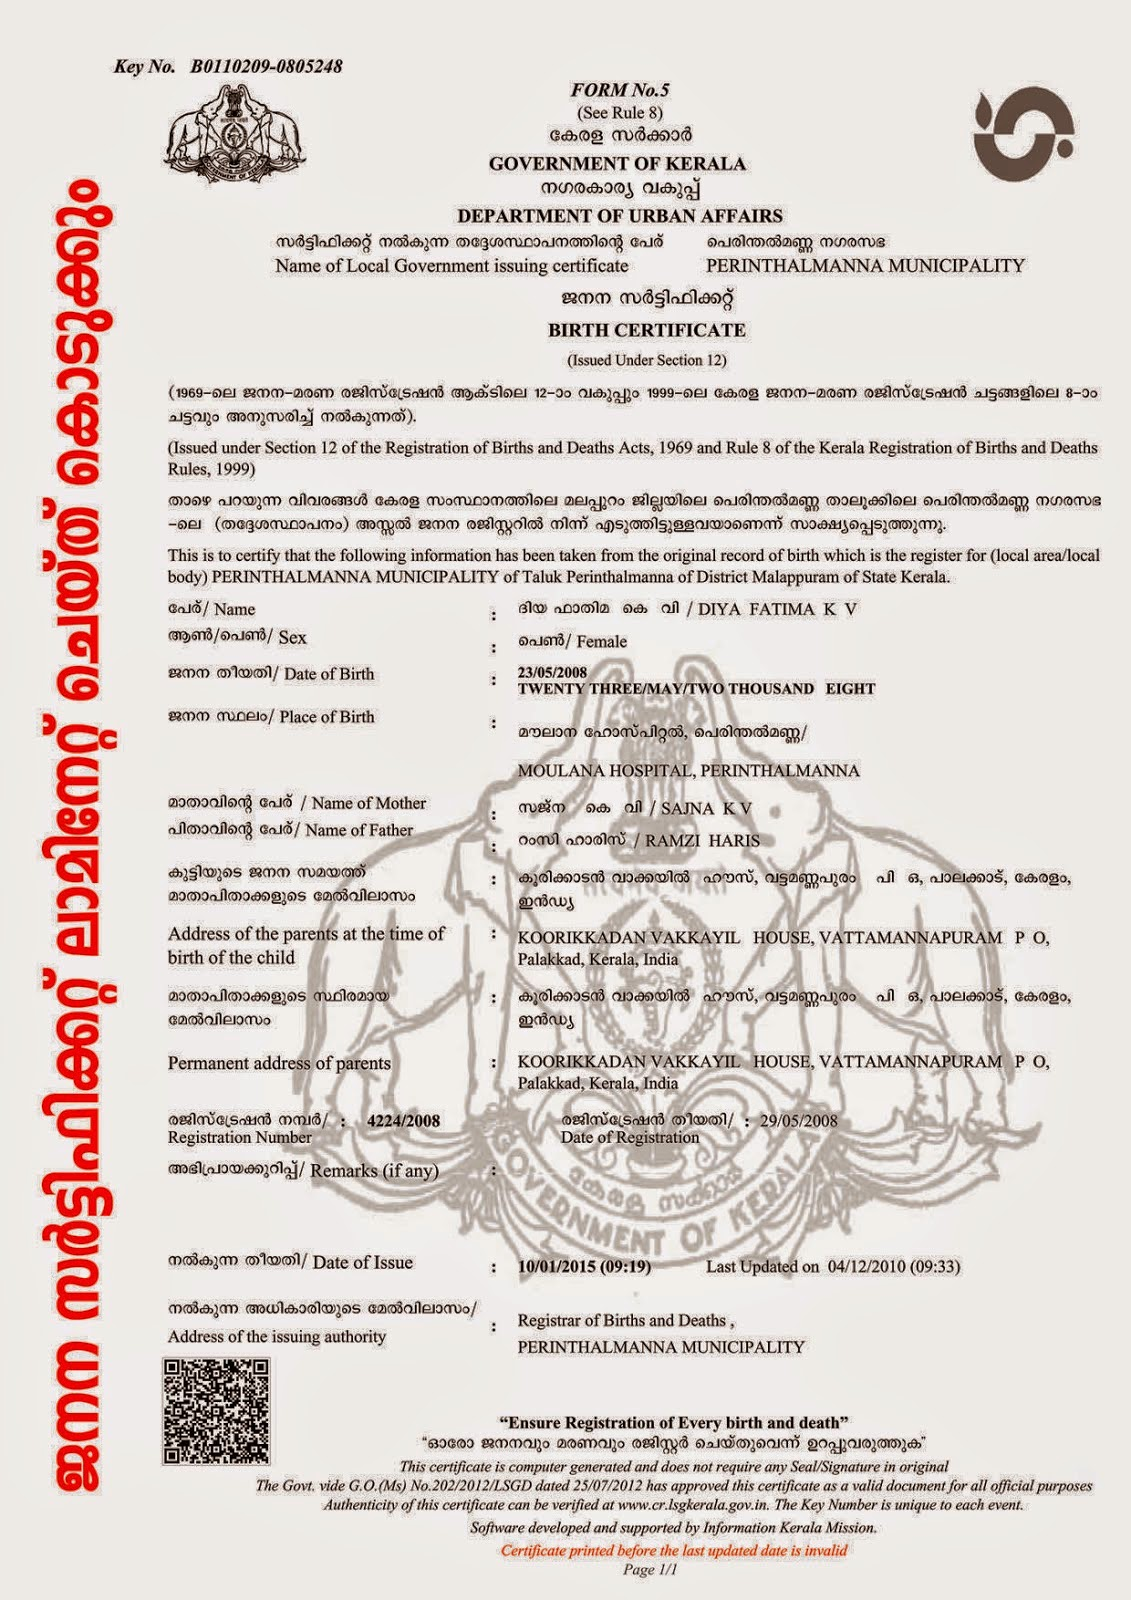 Akshaya Centre Kottappalla Birth Certificate Download And Lamination